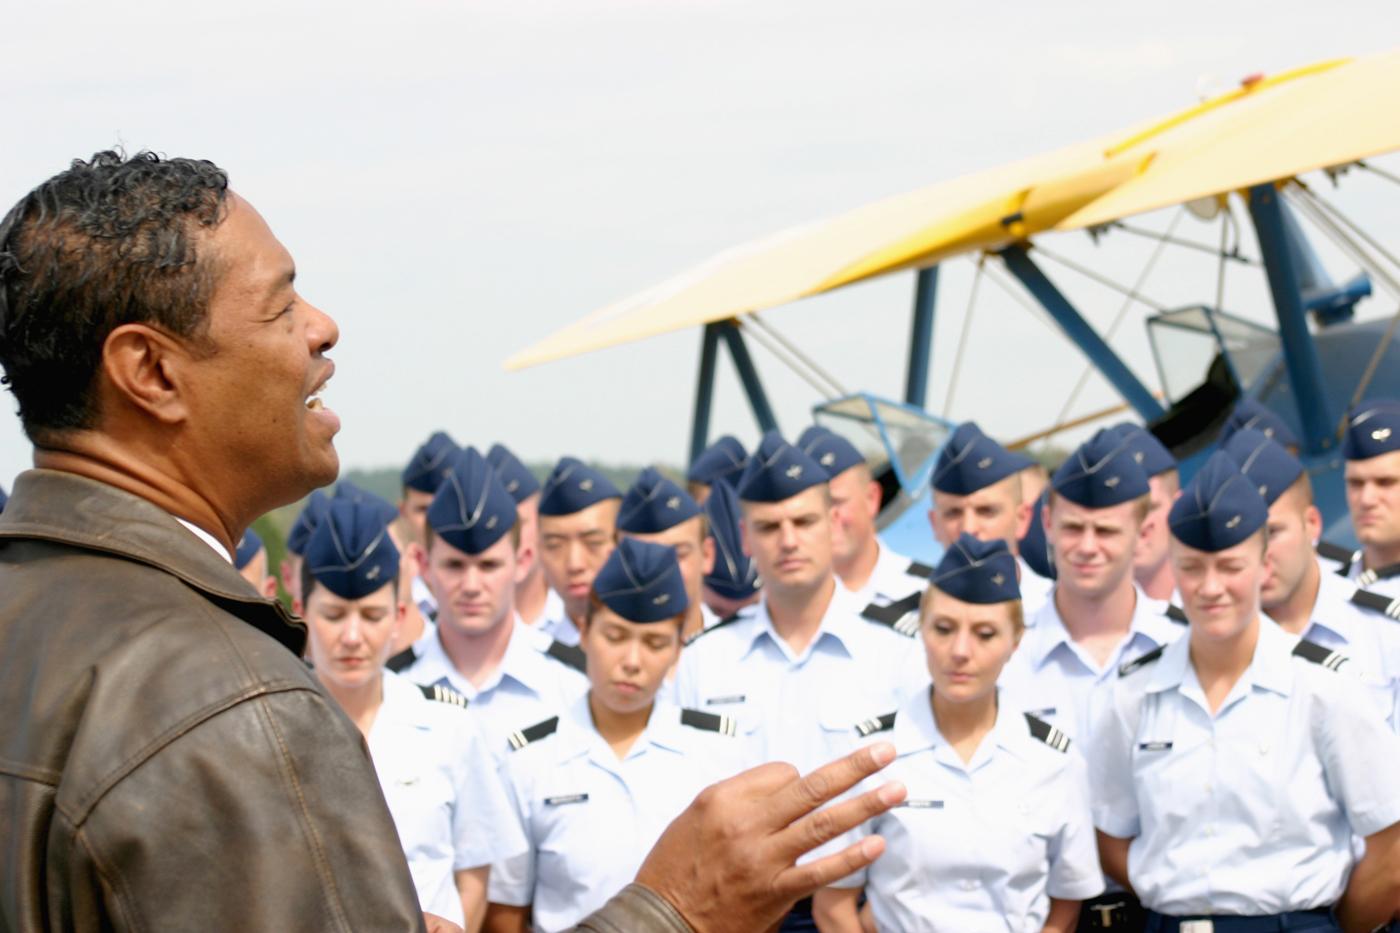 ots incorporates tuskegee airmen into new curriculum